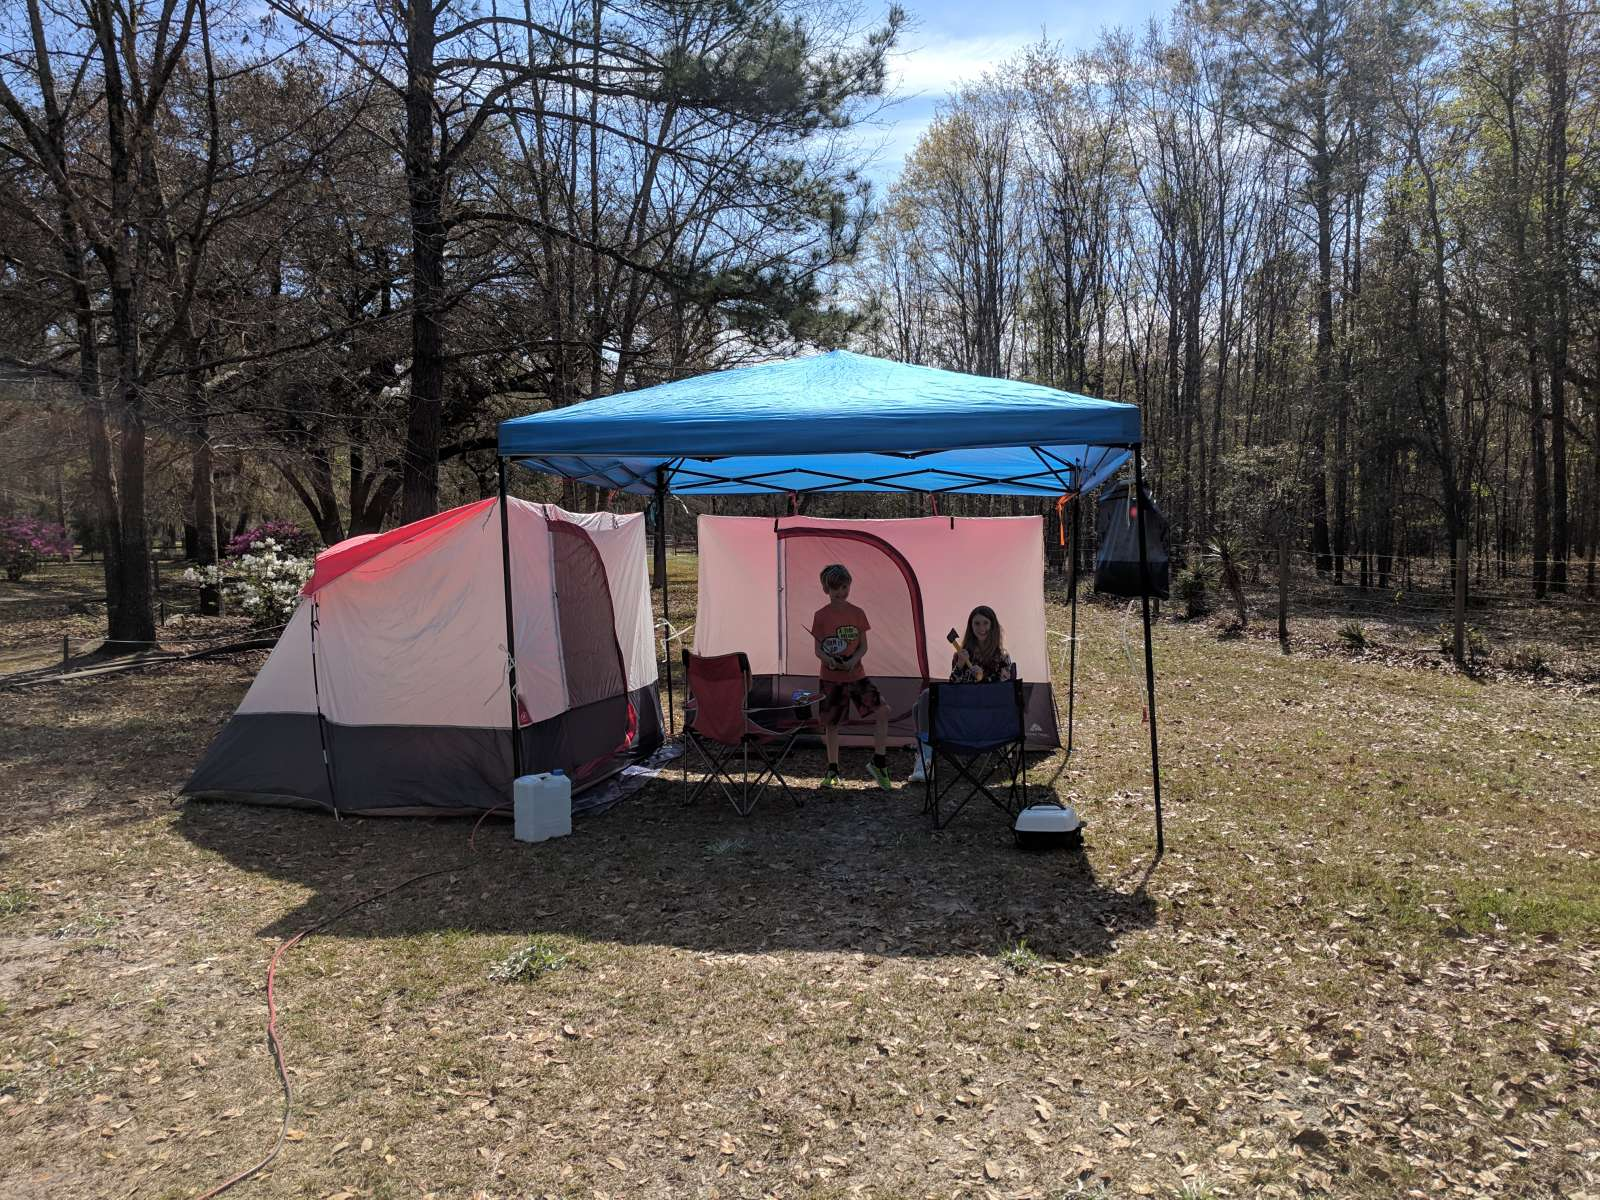 Full hookup tent camping